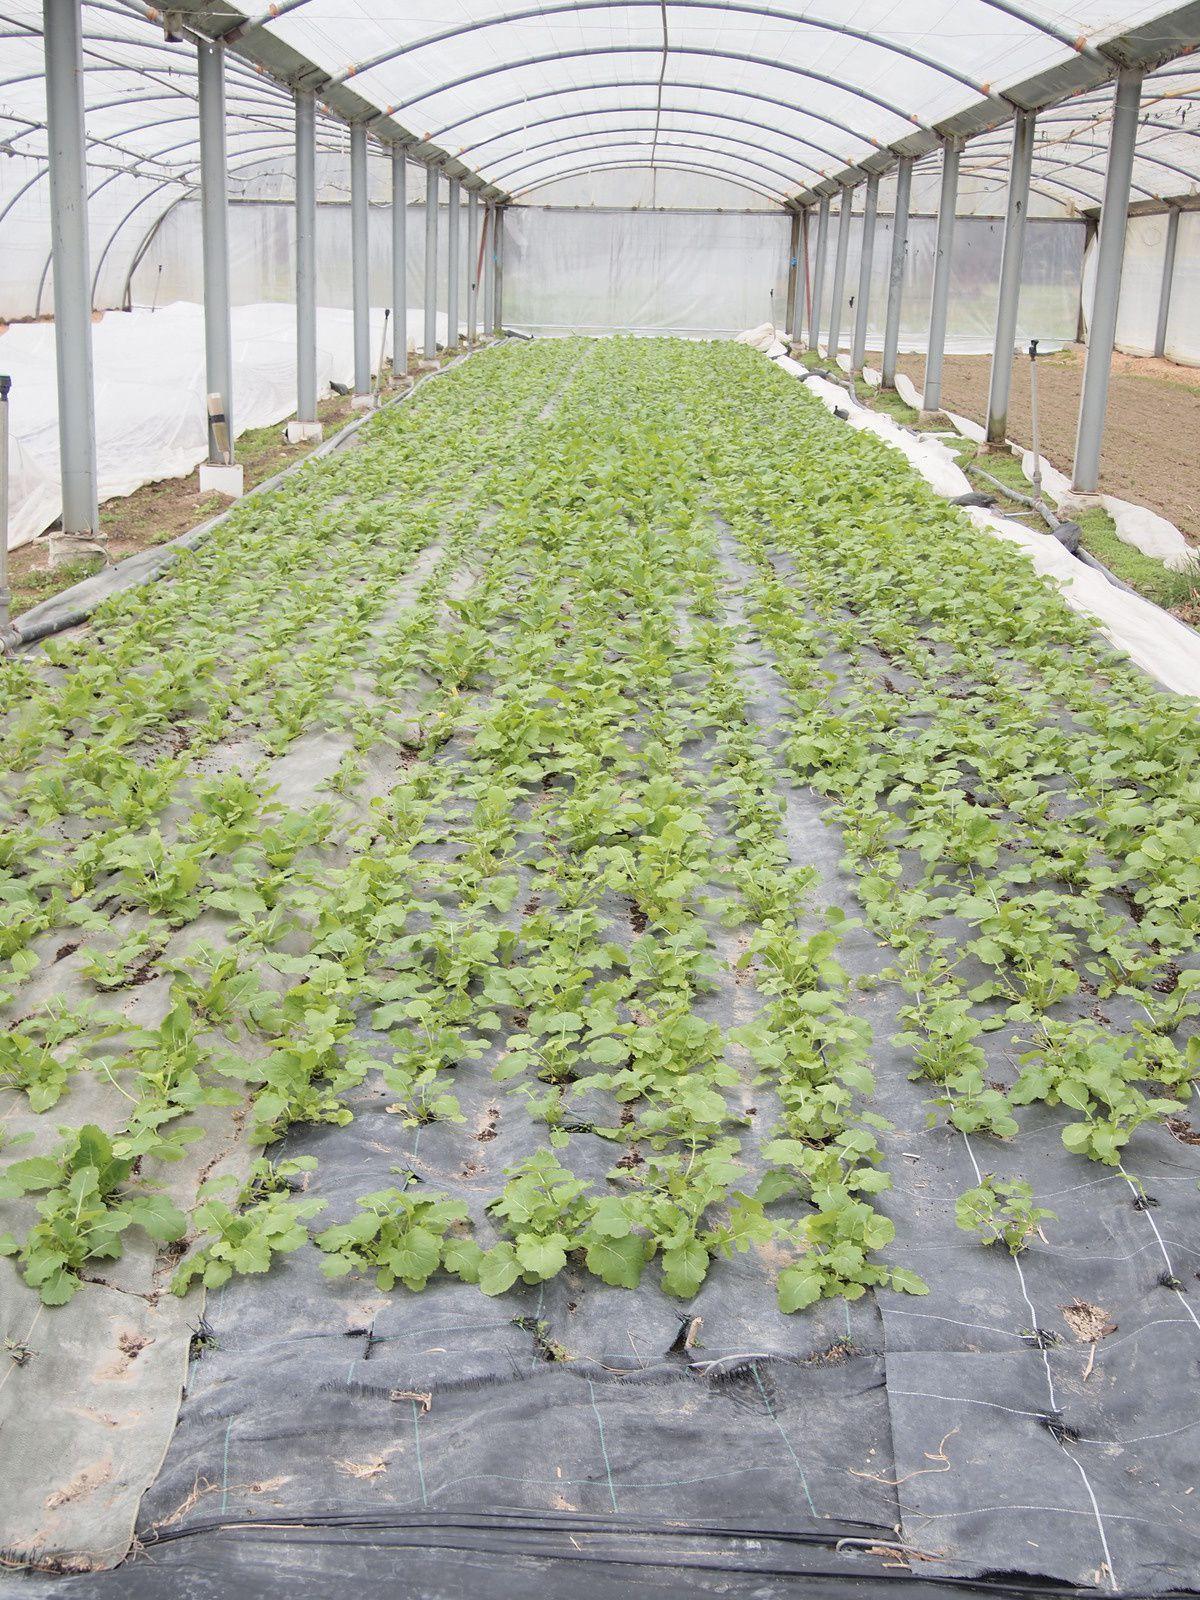 les plantations et semis de printemps l 39 appel du potager. Black Bedroom Furniture Sets. Home Design Ideas